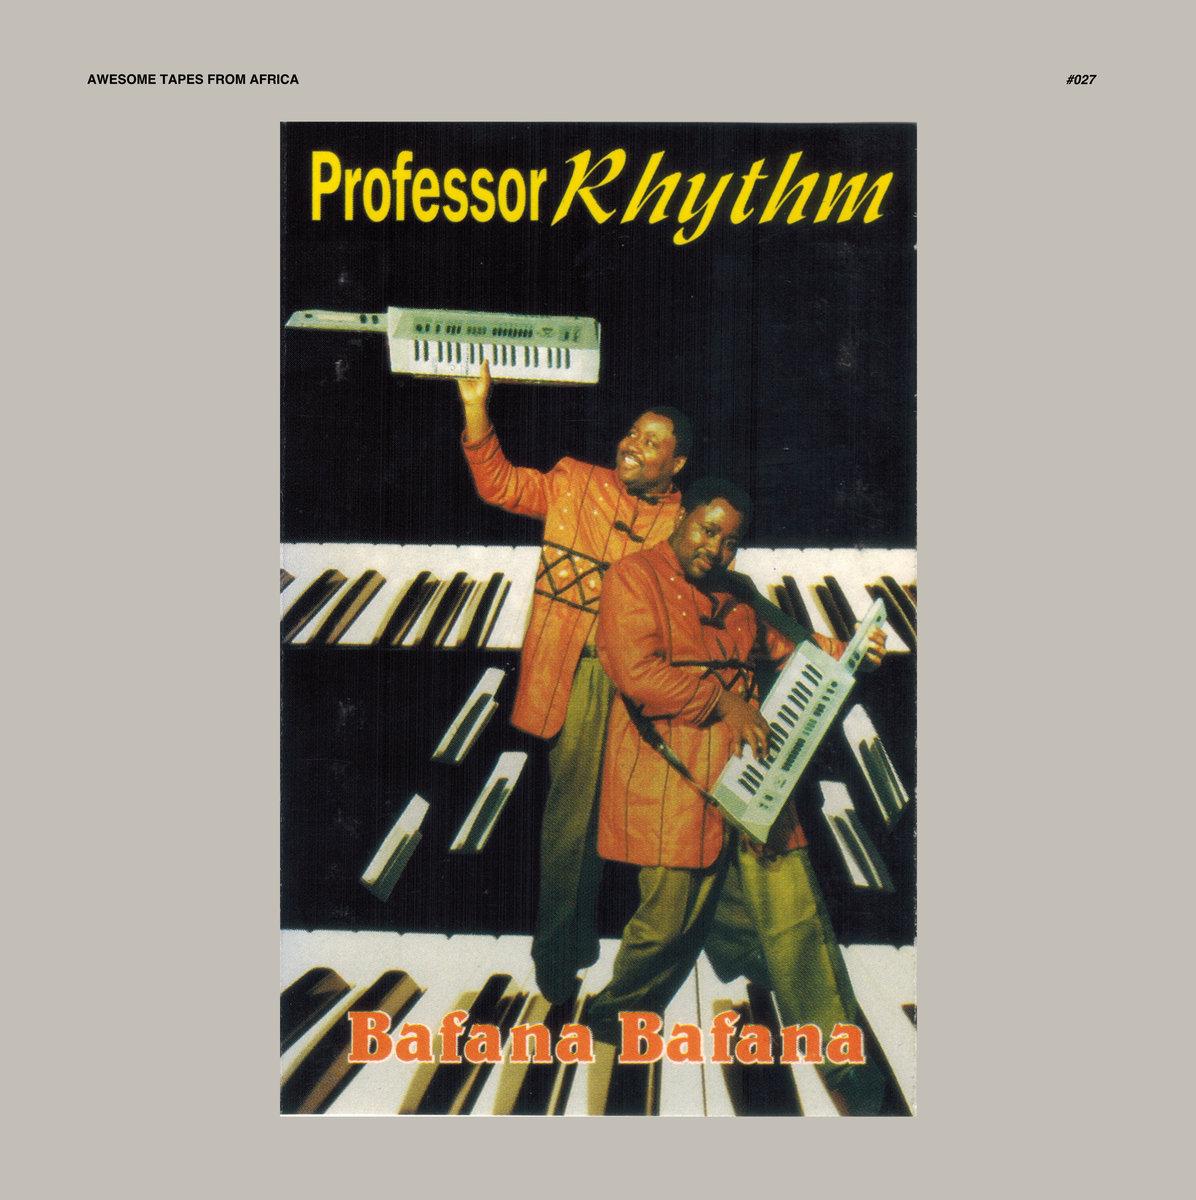 ATFA-ProfessorRhythm.jpg